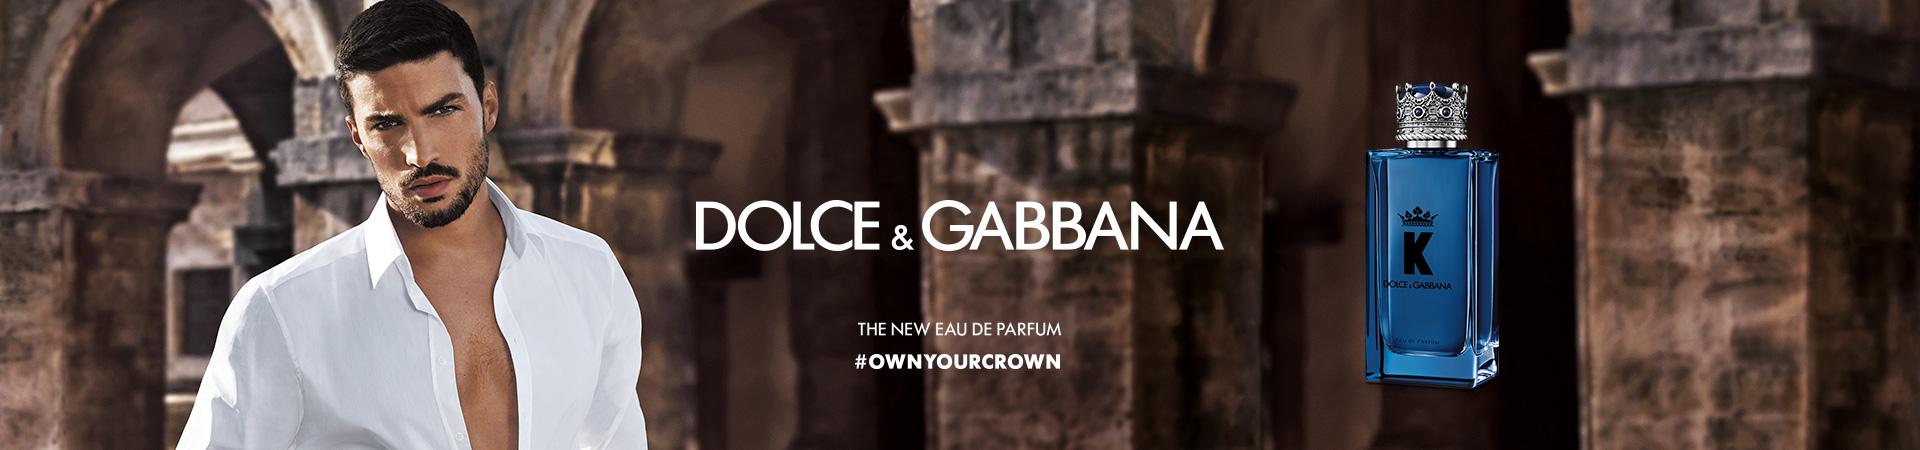 K by Dolce Gabbana